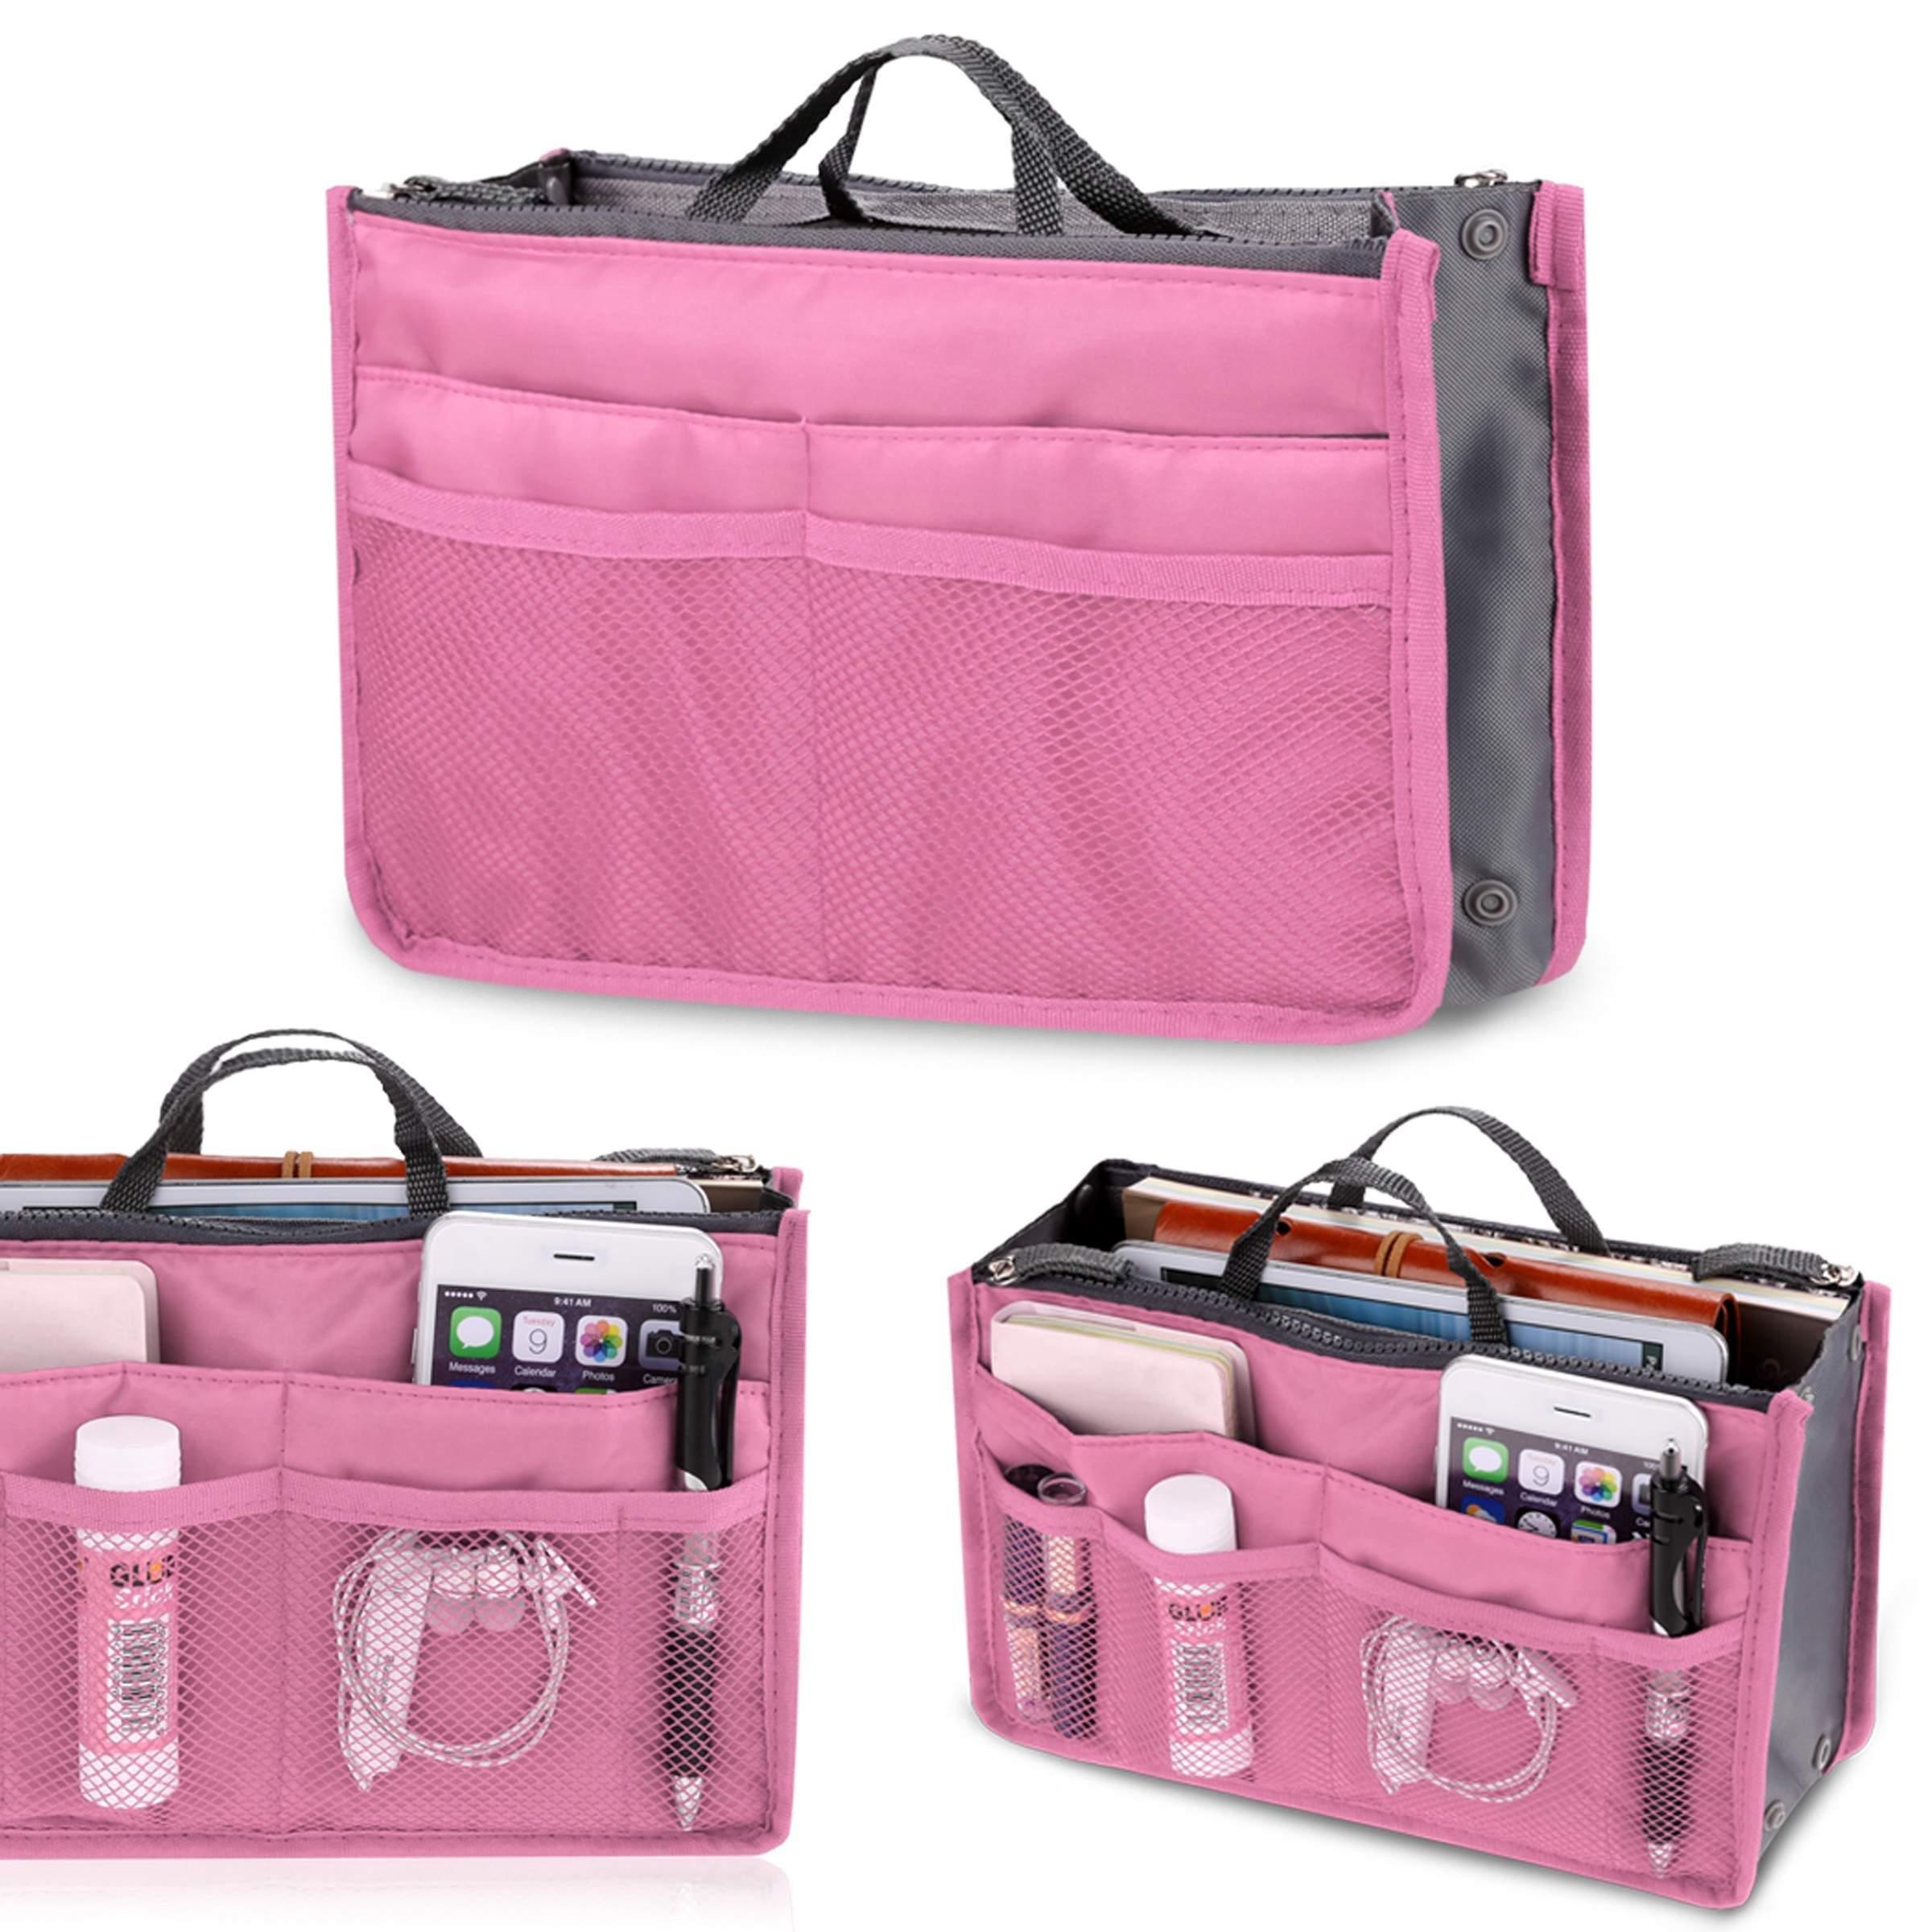 kecooi multifunctional Cosmetic handbag organizer insert makeup bag with 13 Pockets Travel tidy Toiletry Organizer Handbag (Pink)